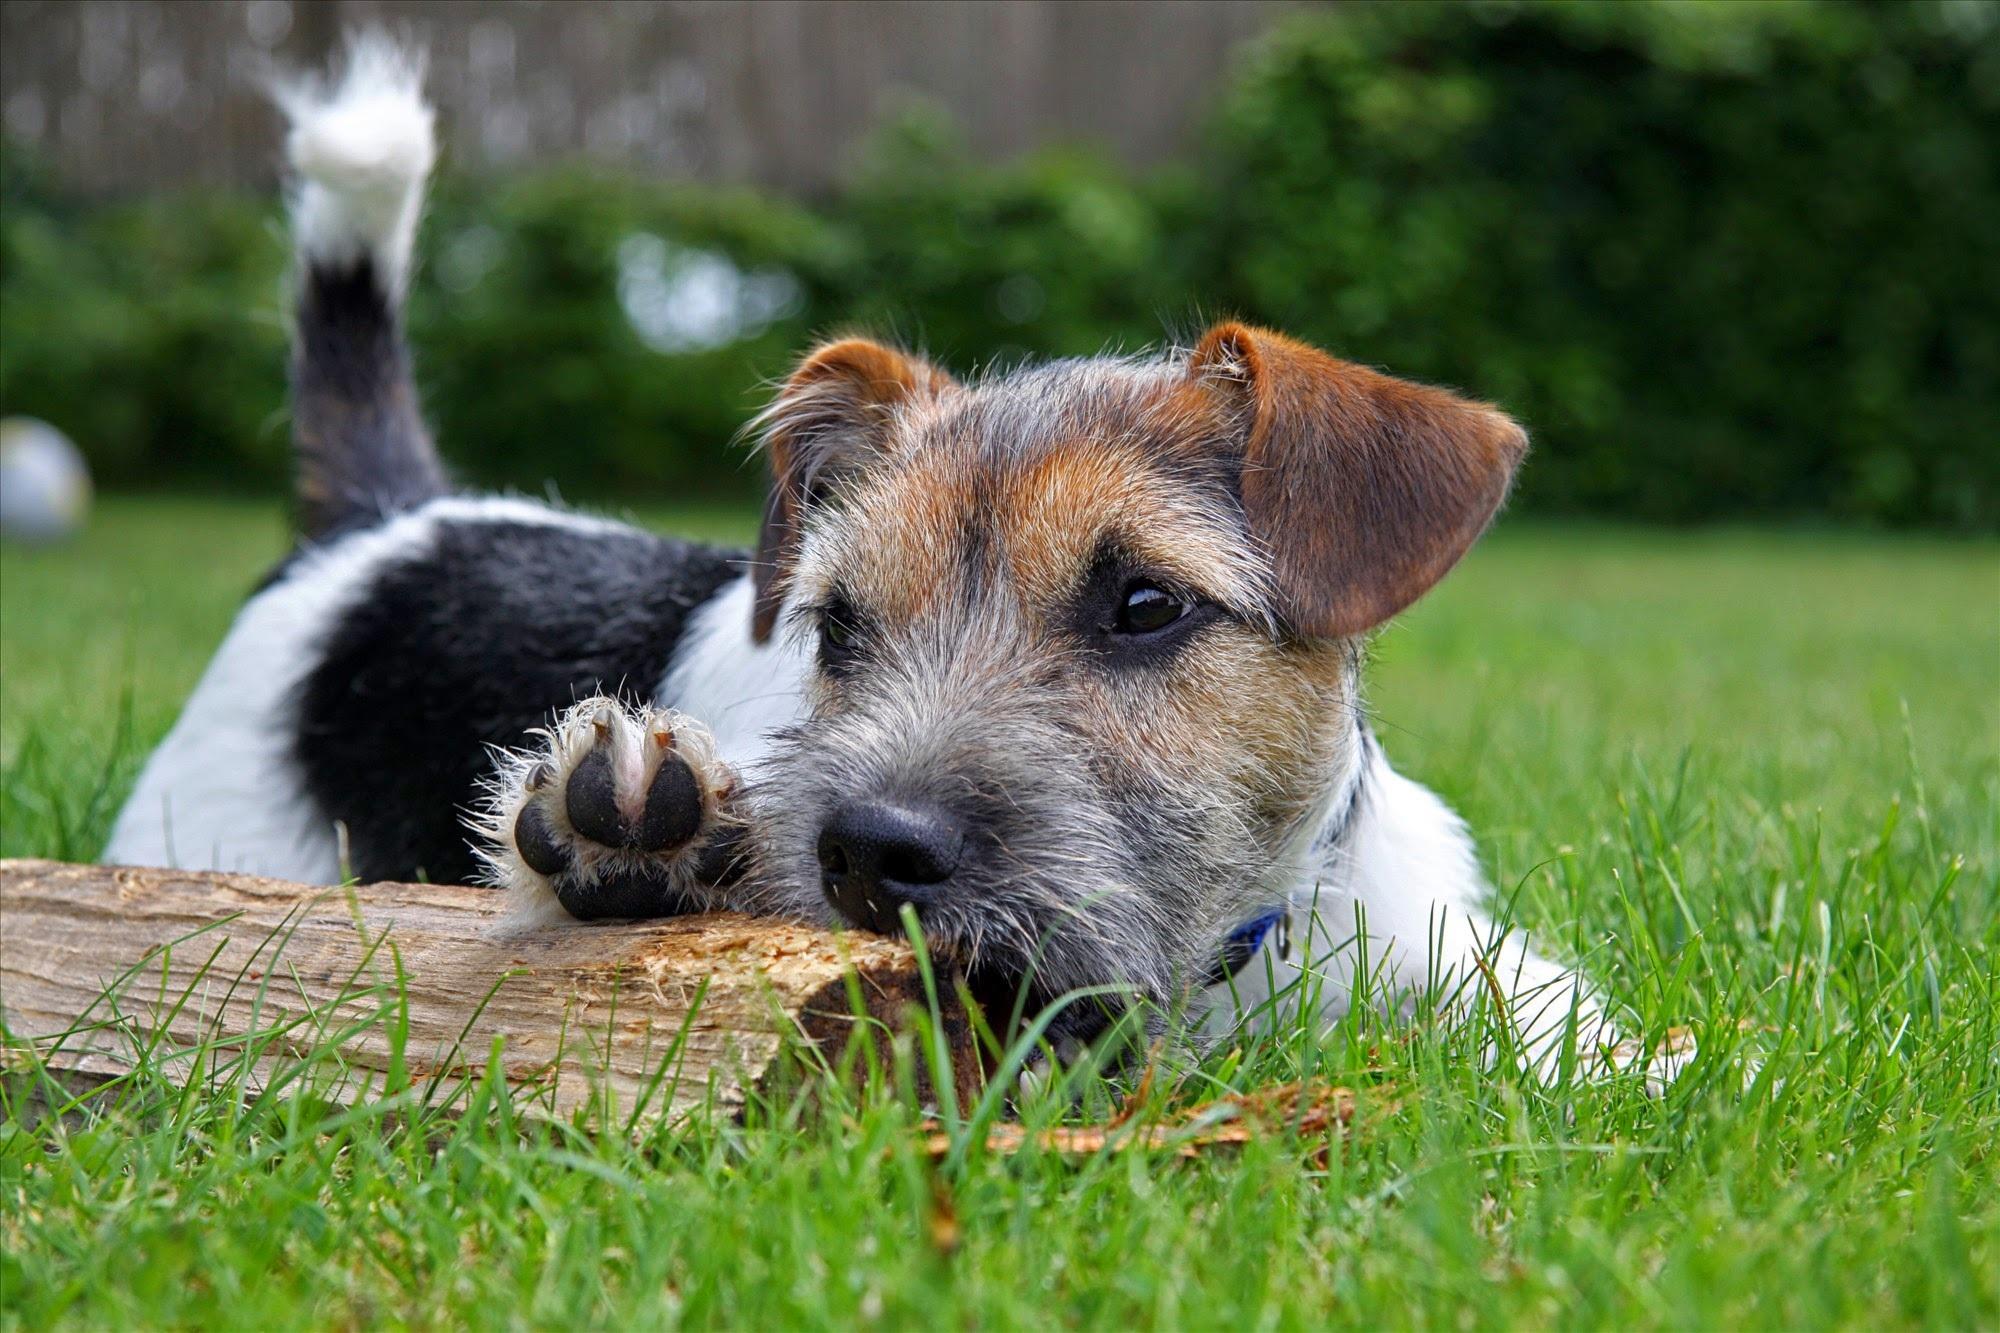 Kostenlose foto : Gras, Wiese, Welpe, Tier, Wirbeltier, Hunderasse ...